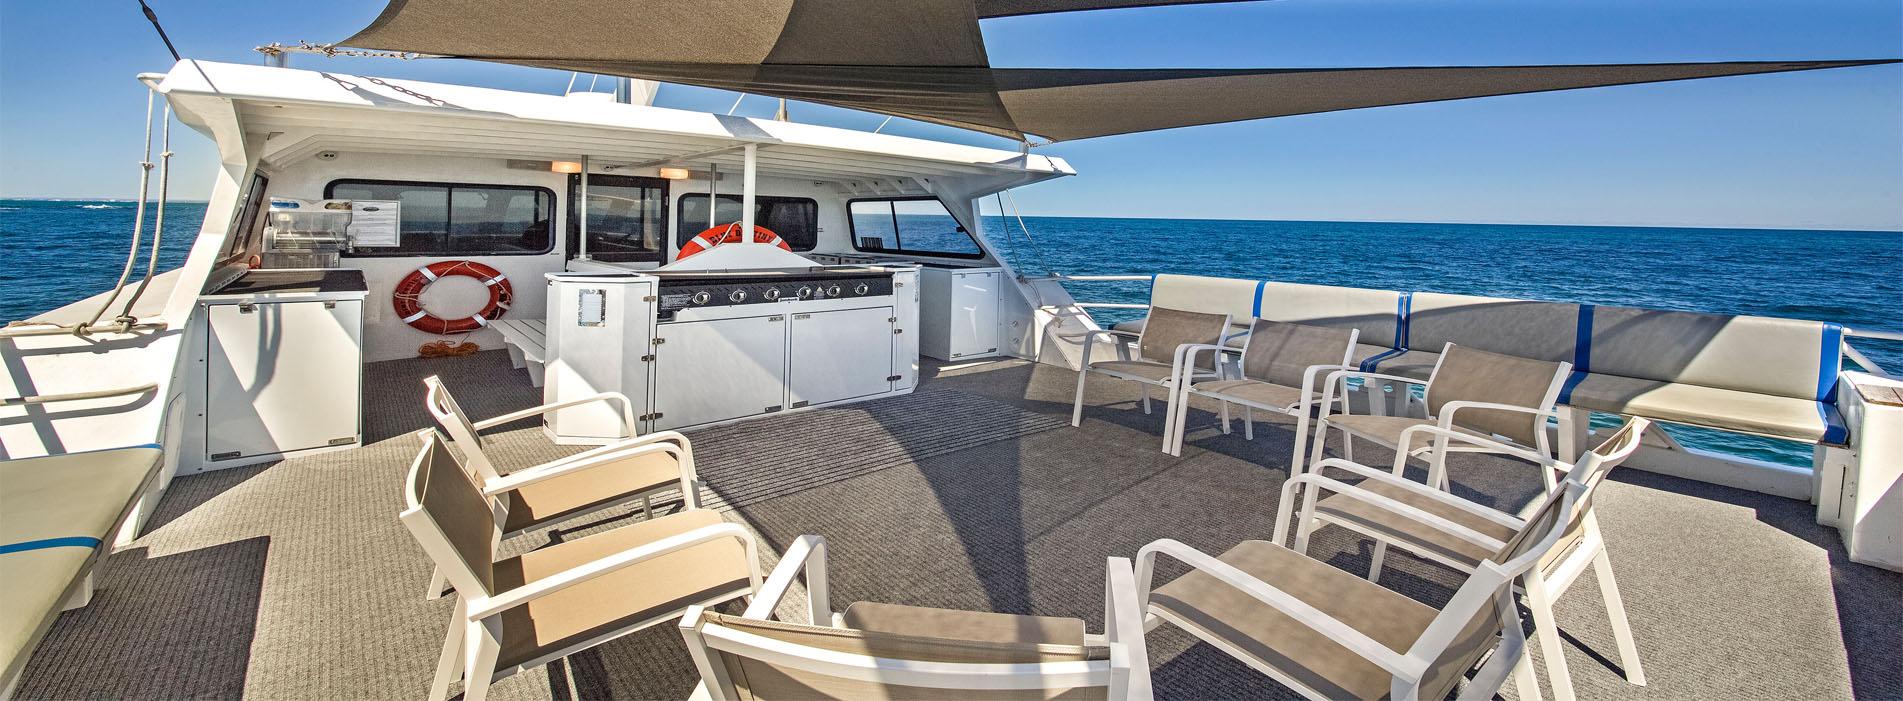 BLUE DESTINY kitchenette on upper deck charters